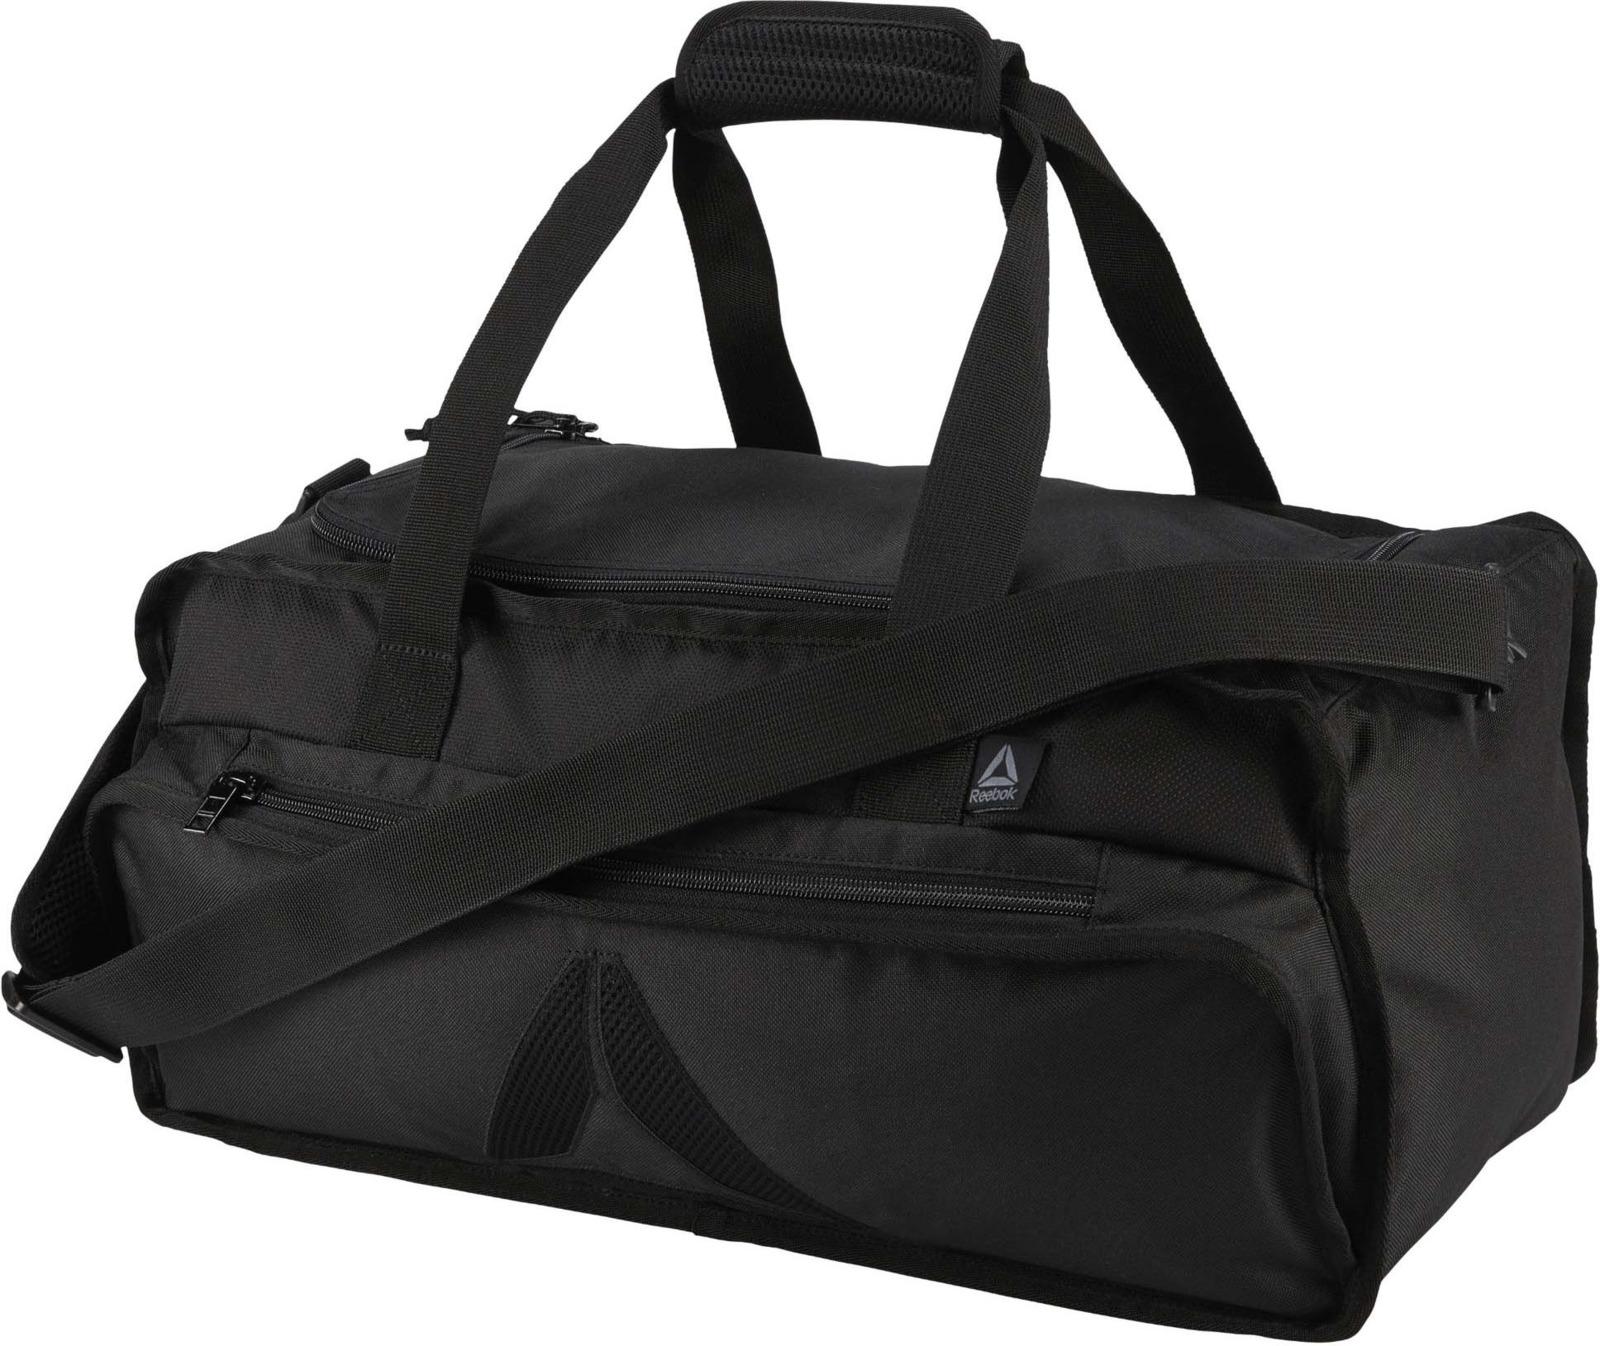 Сумка Reebok Act Enh Grip M, цвет: черный. DU2906 куртка мужская reebok od dwnlk jckt цвет черный d78631 размер m 50